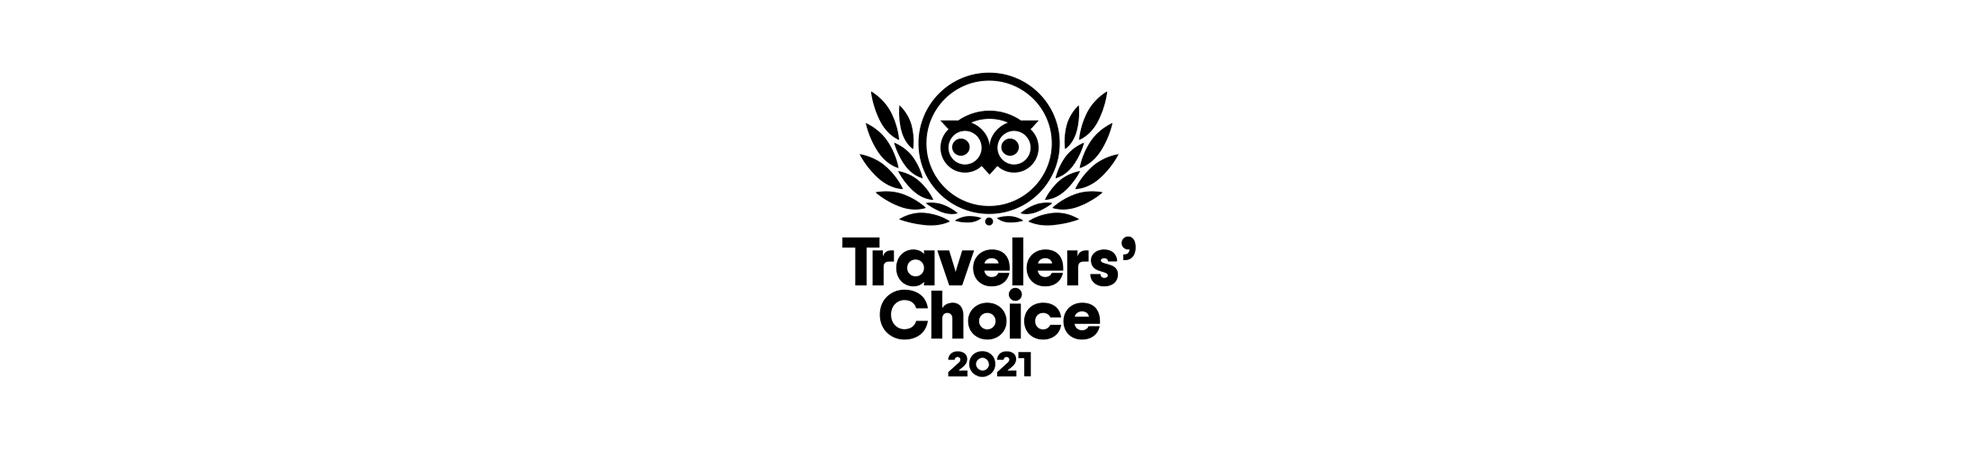 Traveller's Choice Tripadvisor AP Hotels and Resorts